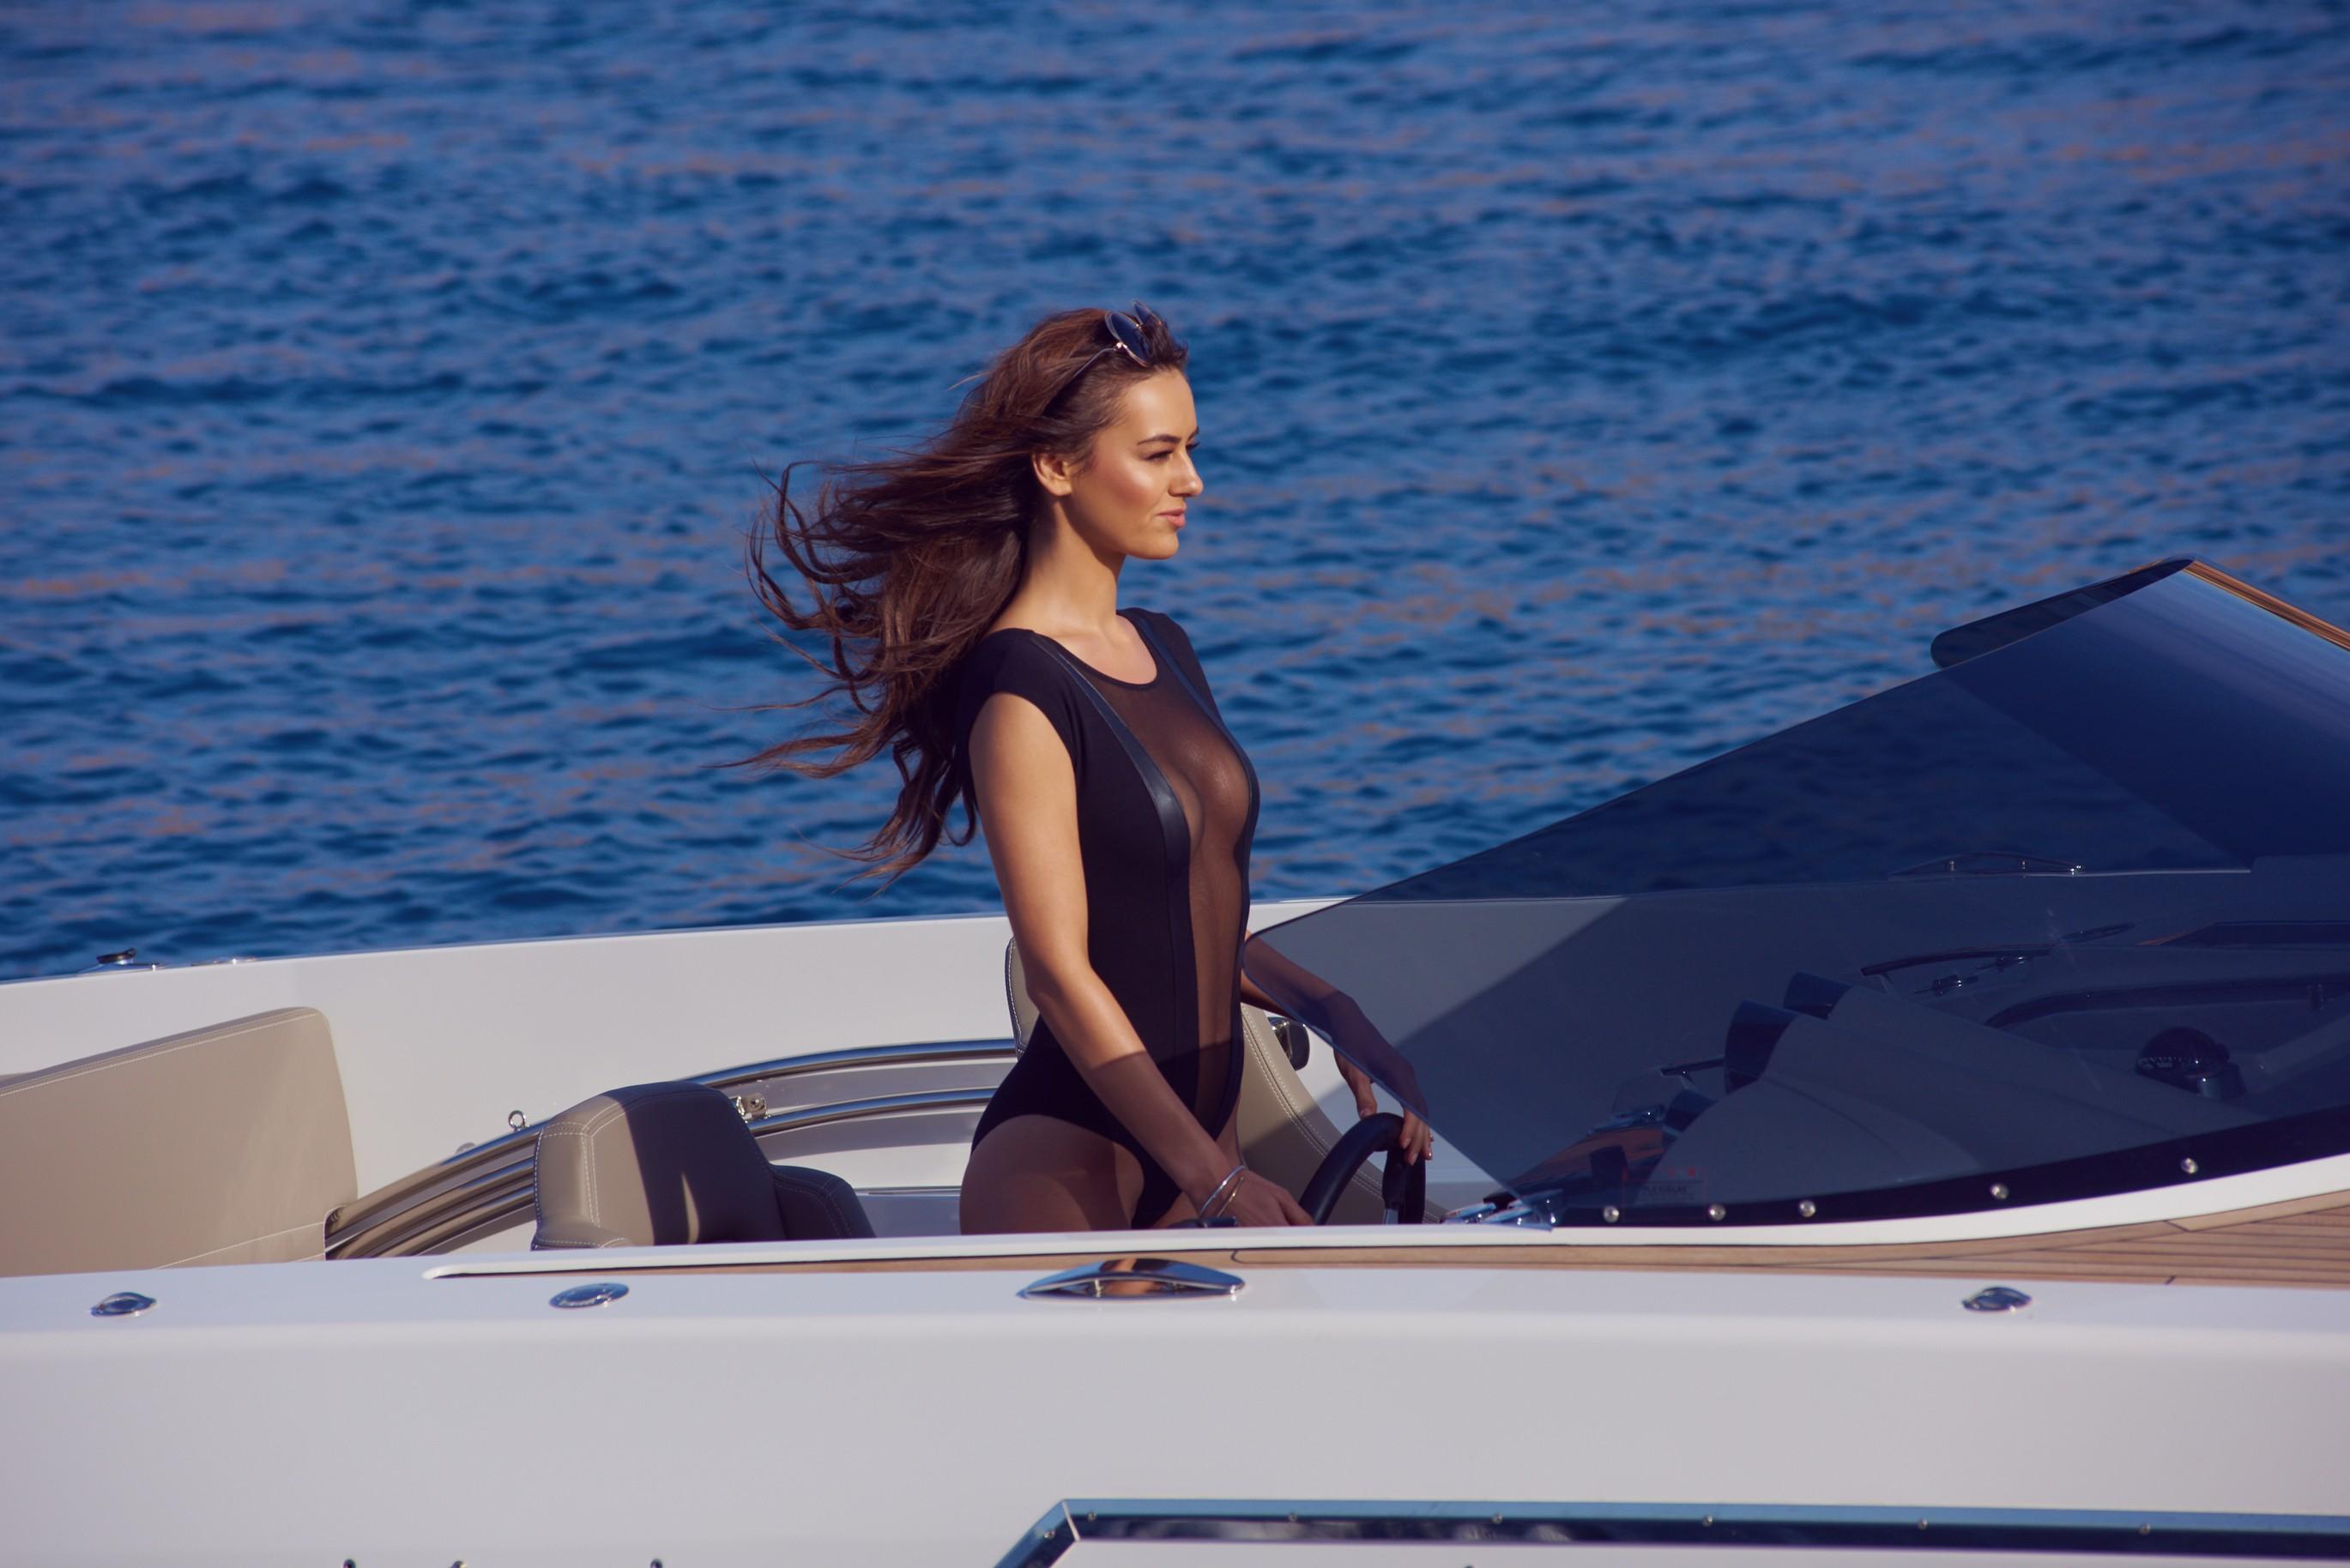 veronika-klimovits-naked-diving-motorboat-seaside-playboy-01